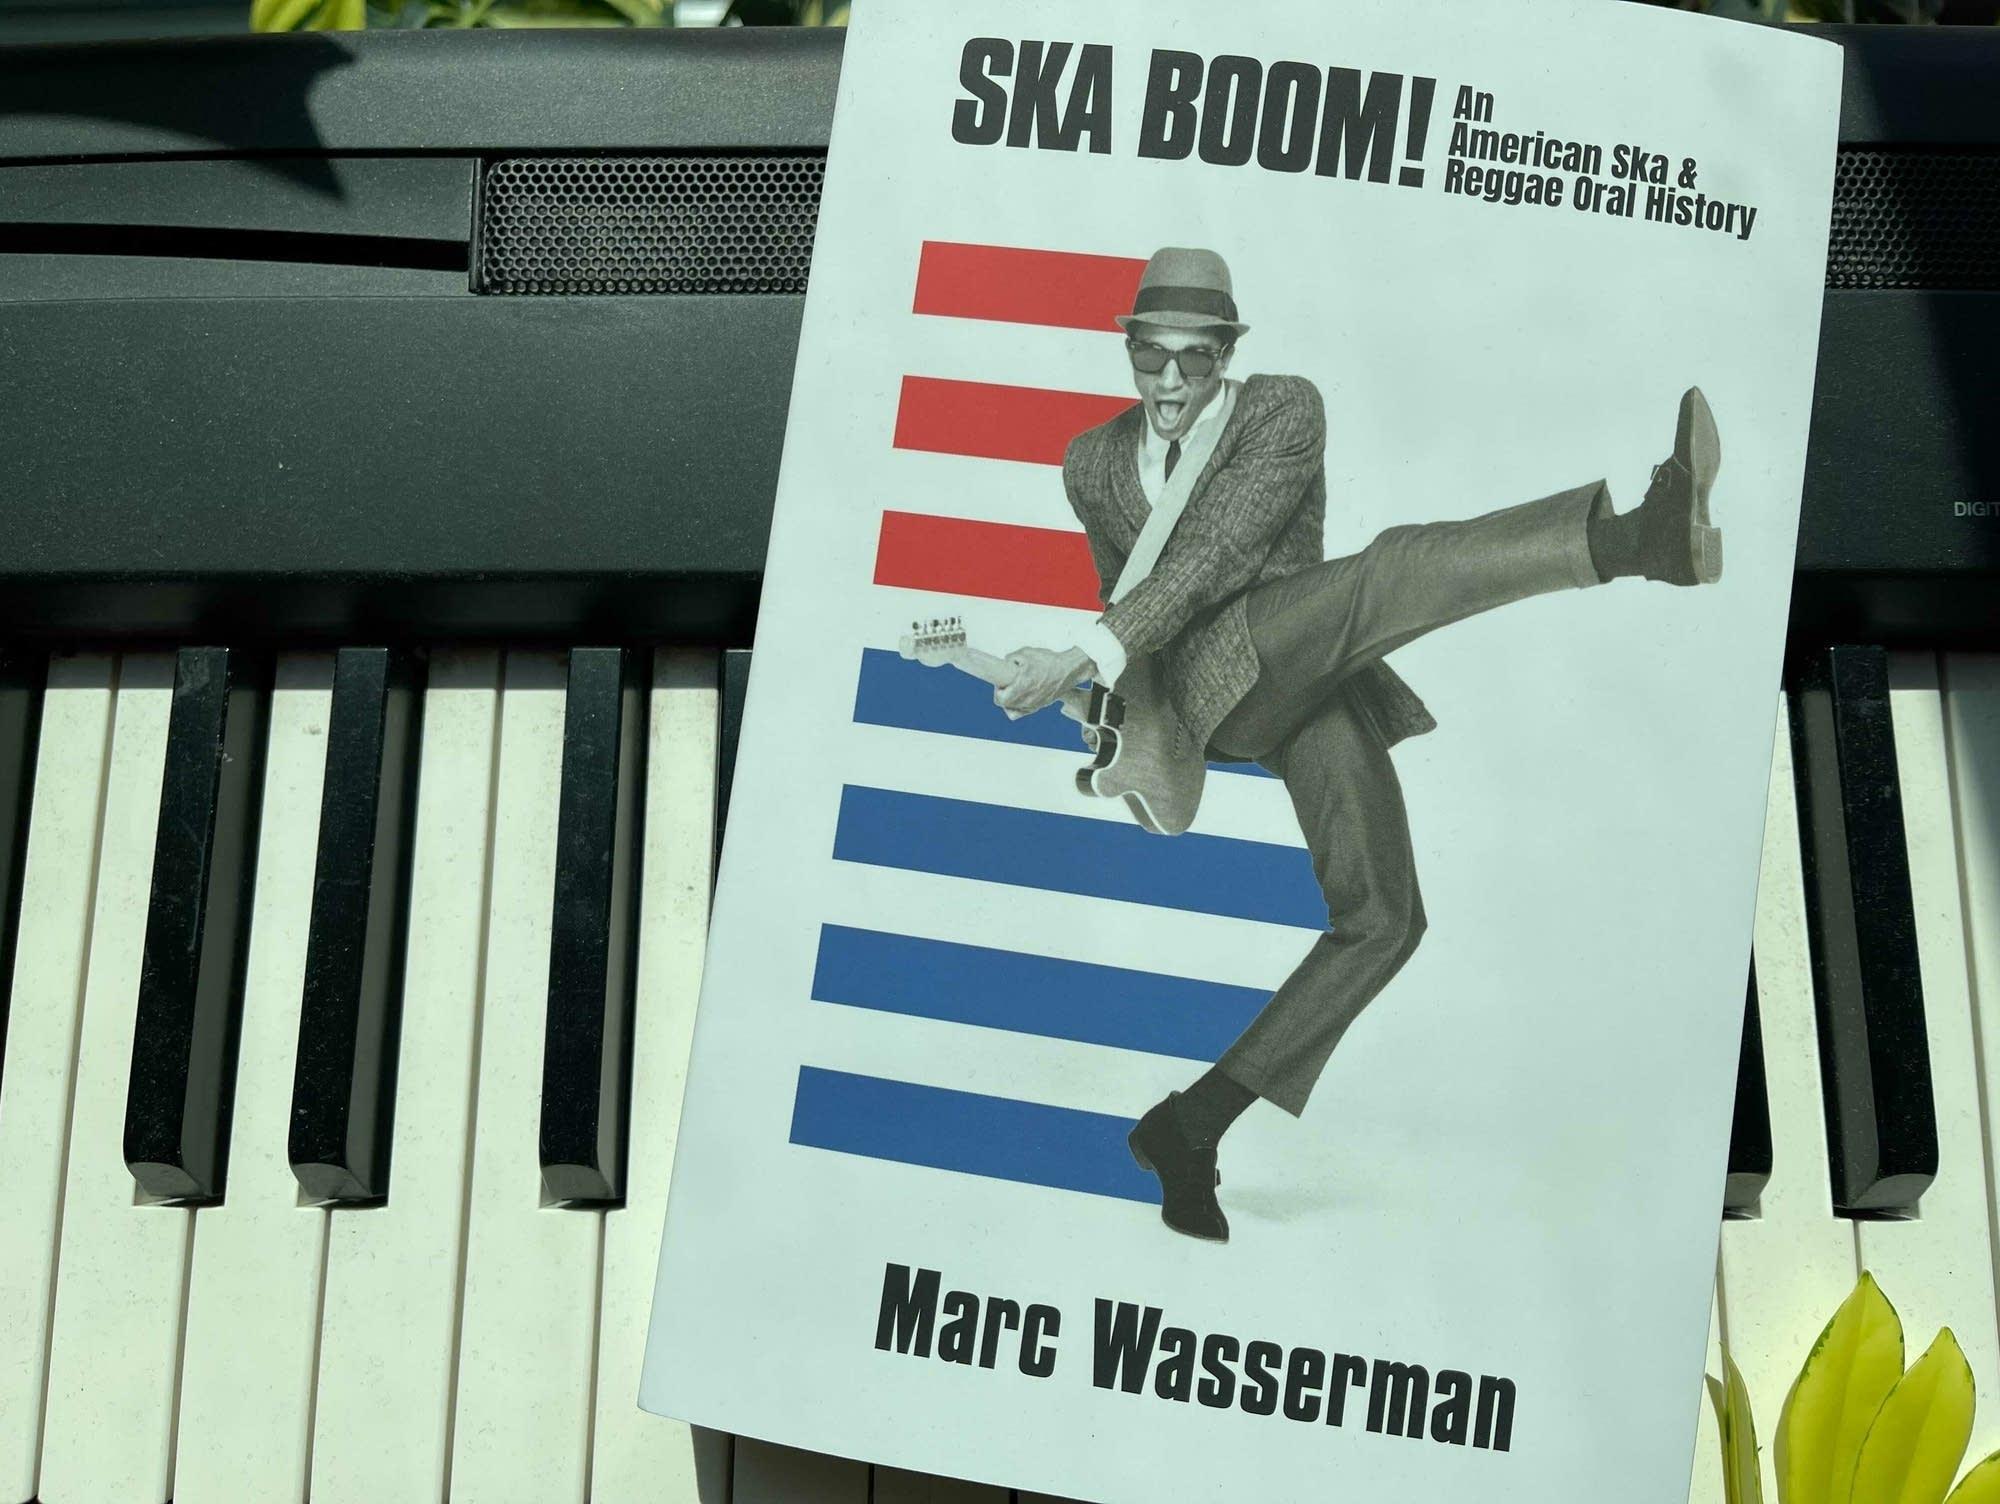 Book on keyboard: 'Ska Boom! An American Ska & Reggae Oral History.'